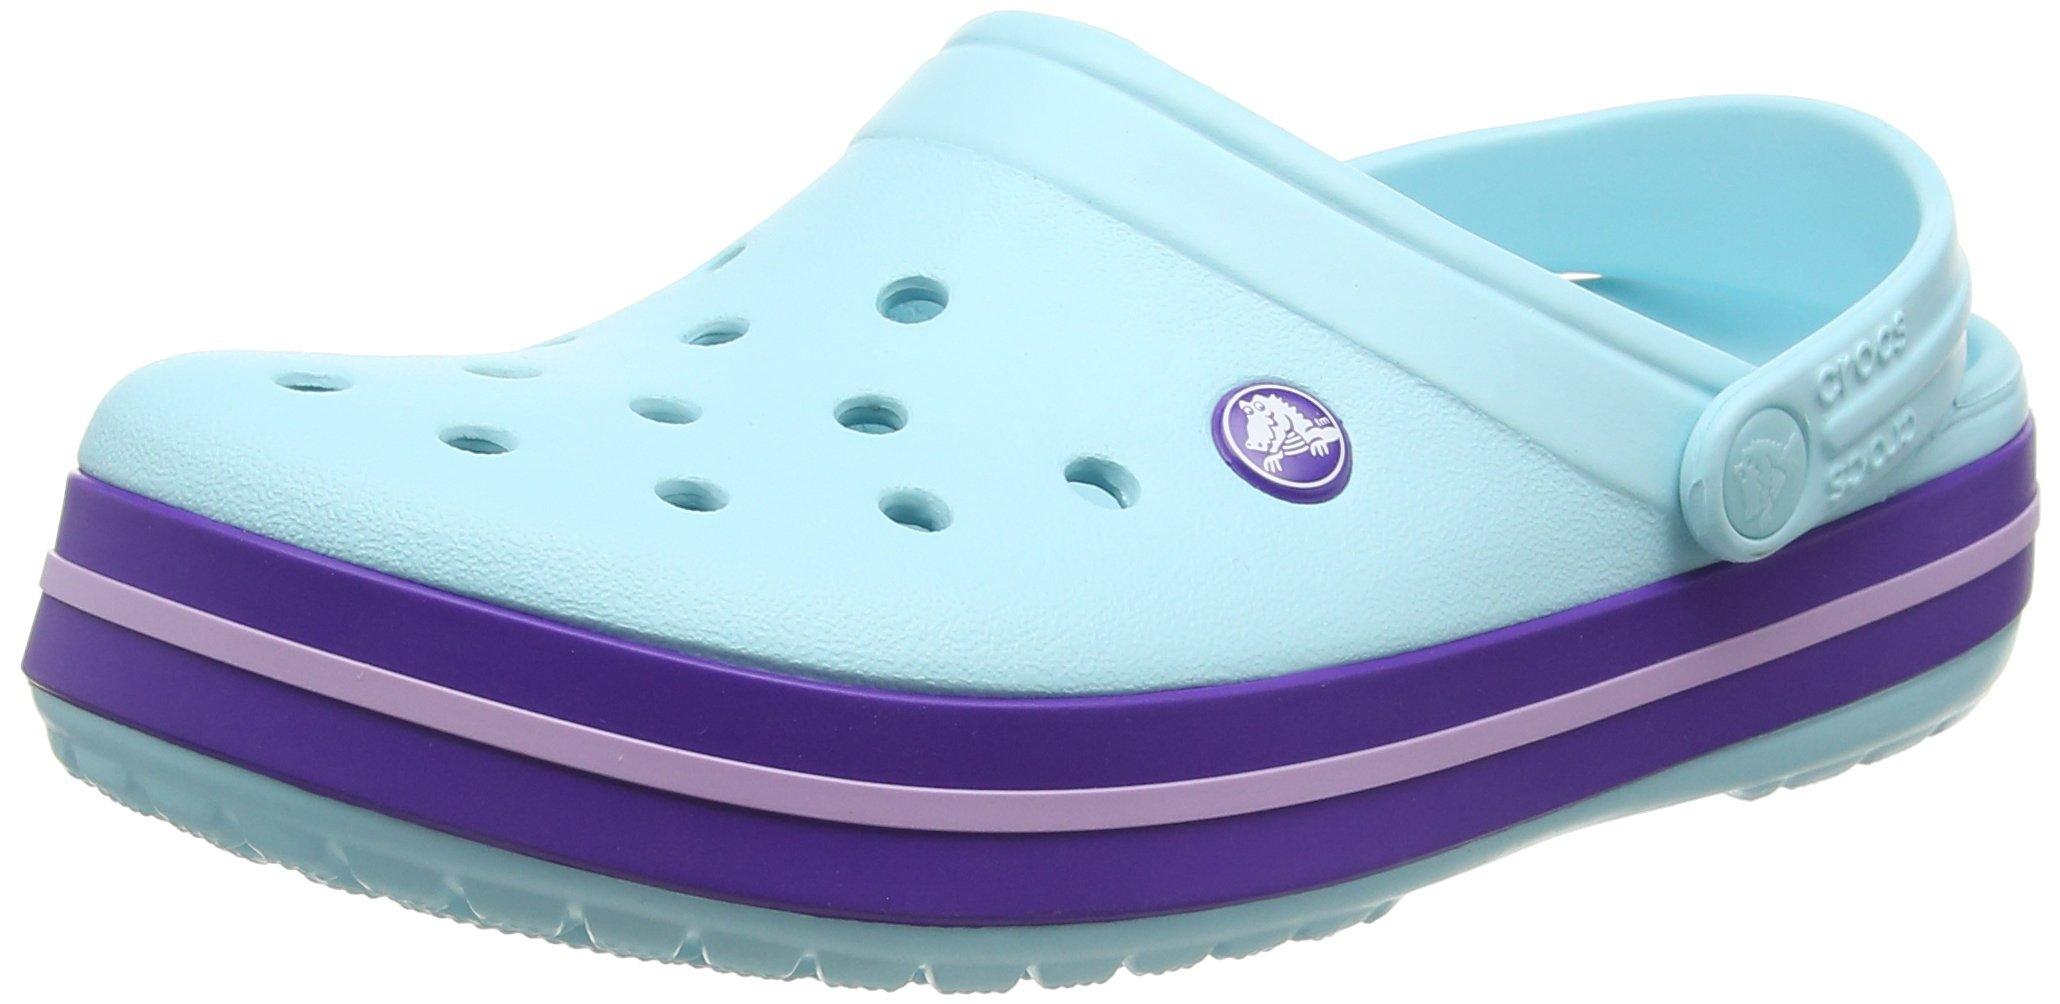 Crocs Crocband Ice Blue Size EU 36-37 - US M4/W6